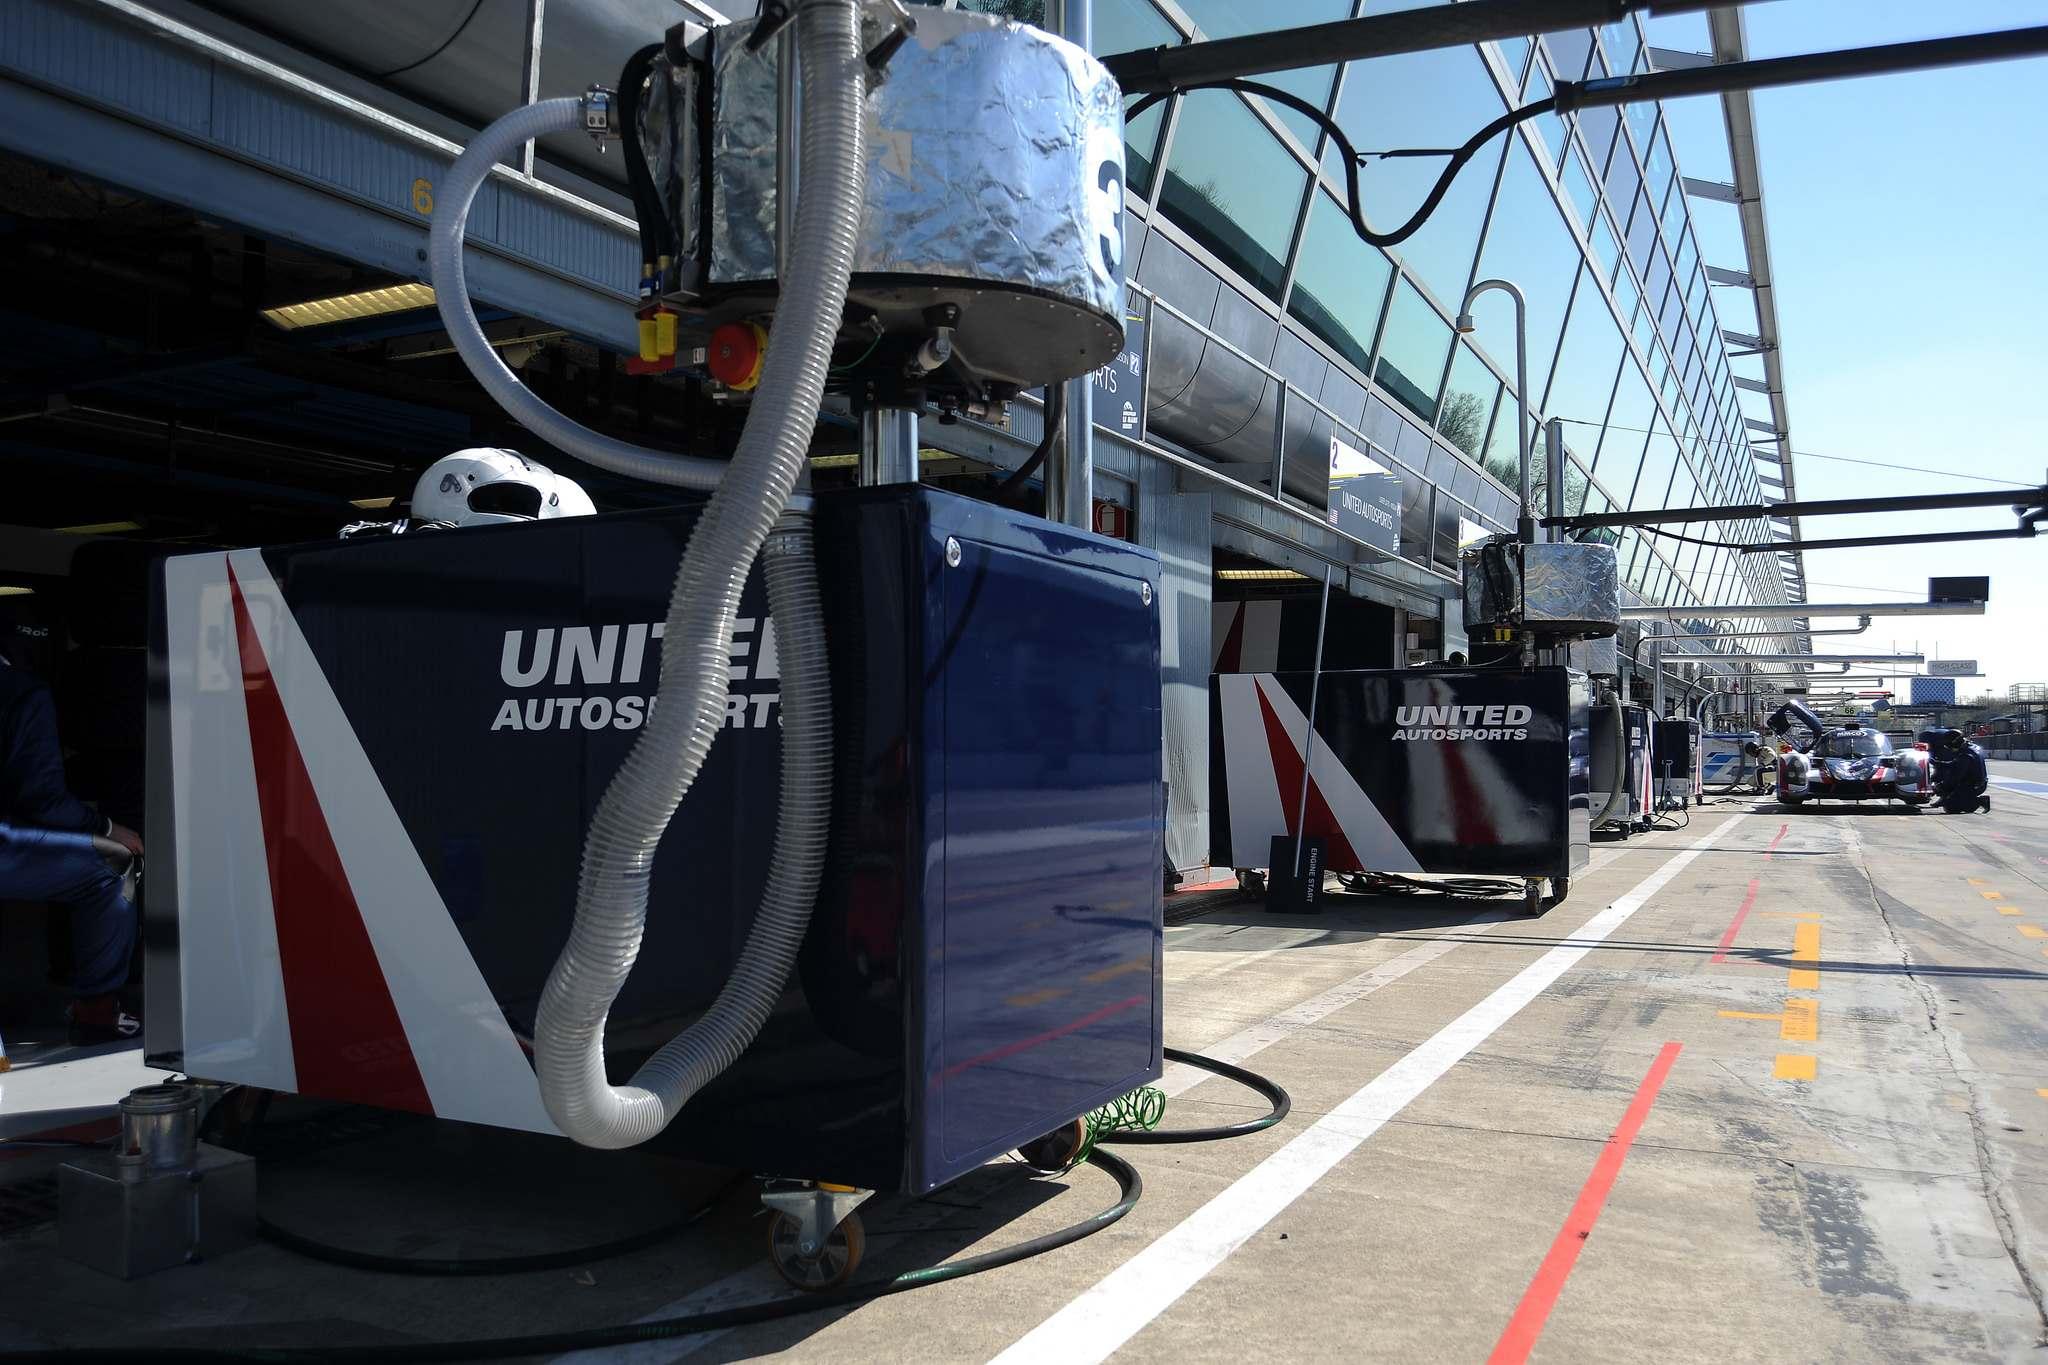 unitedautosports6 United Autosports in Monza